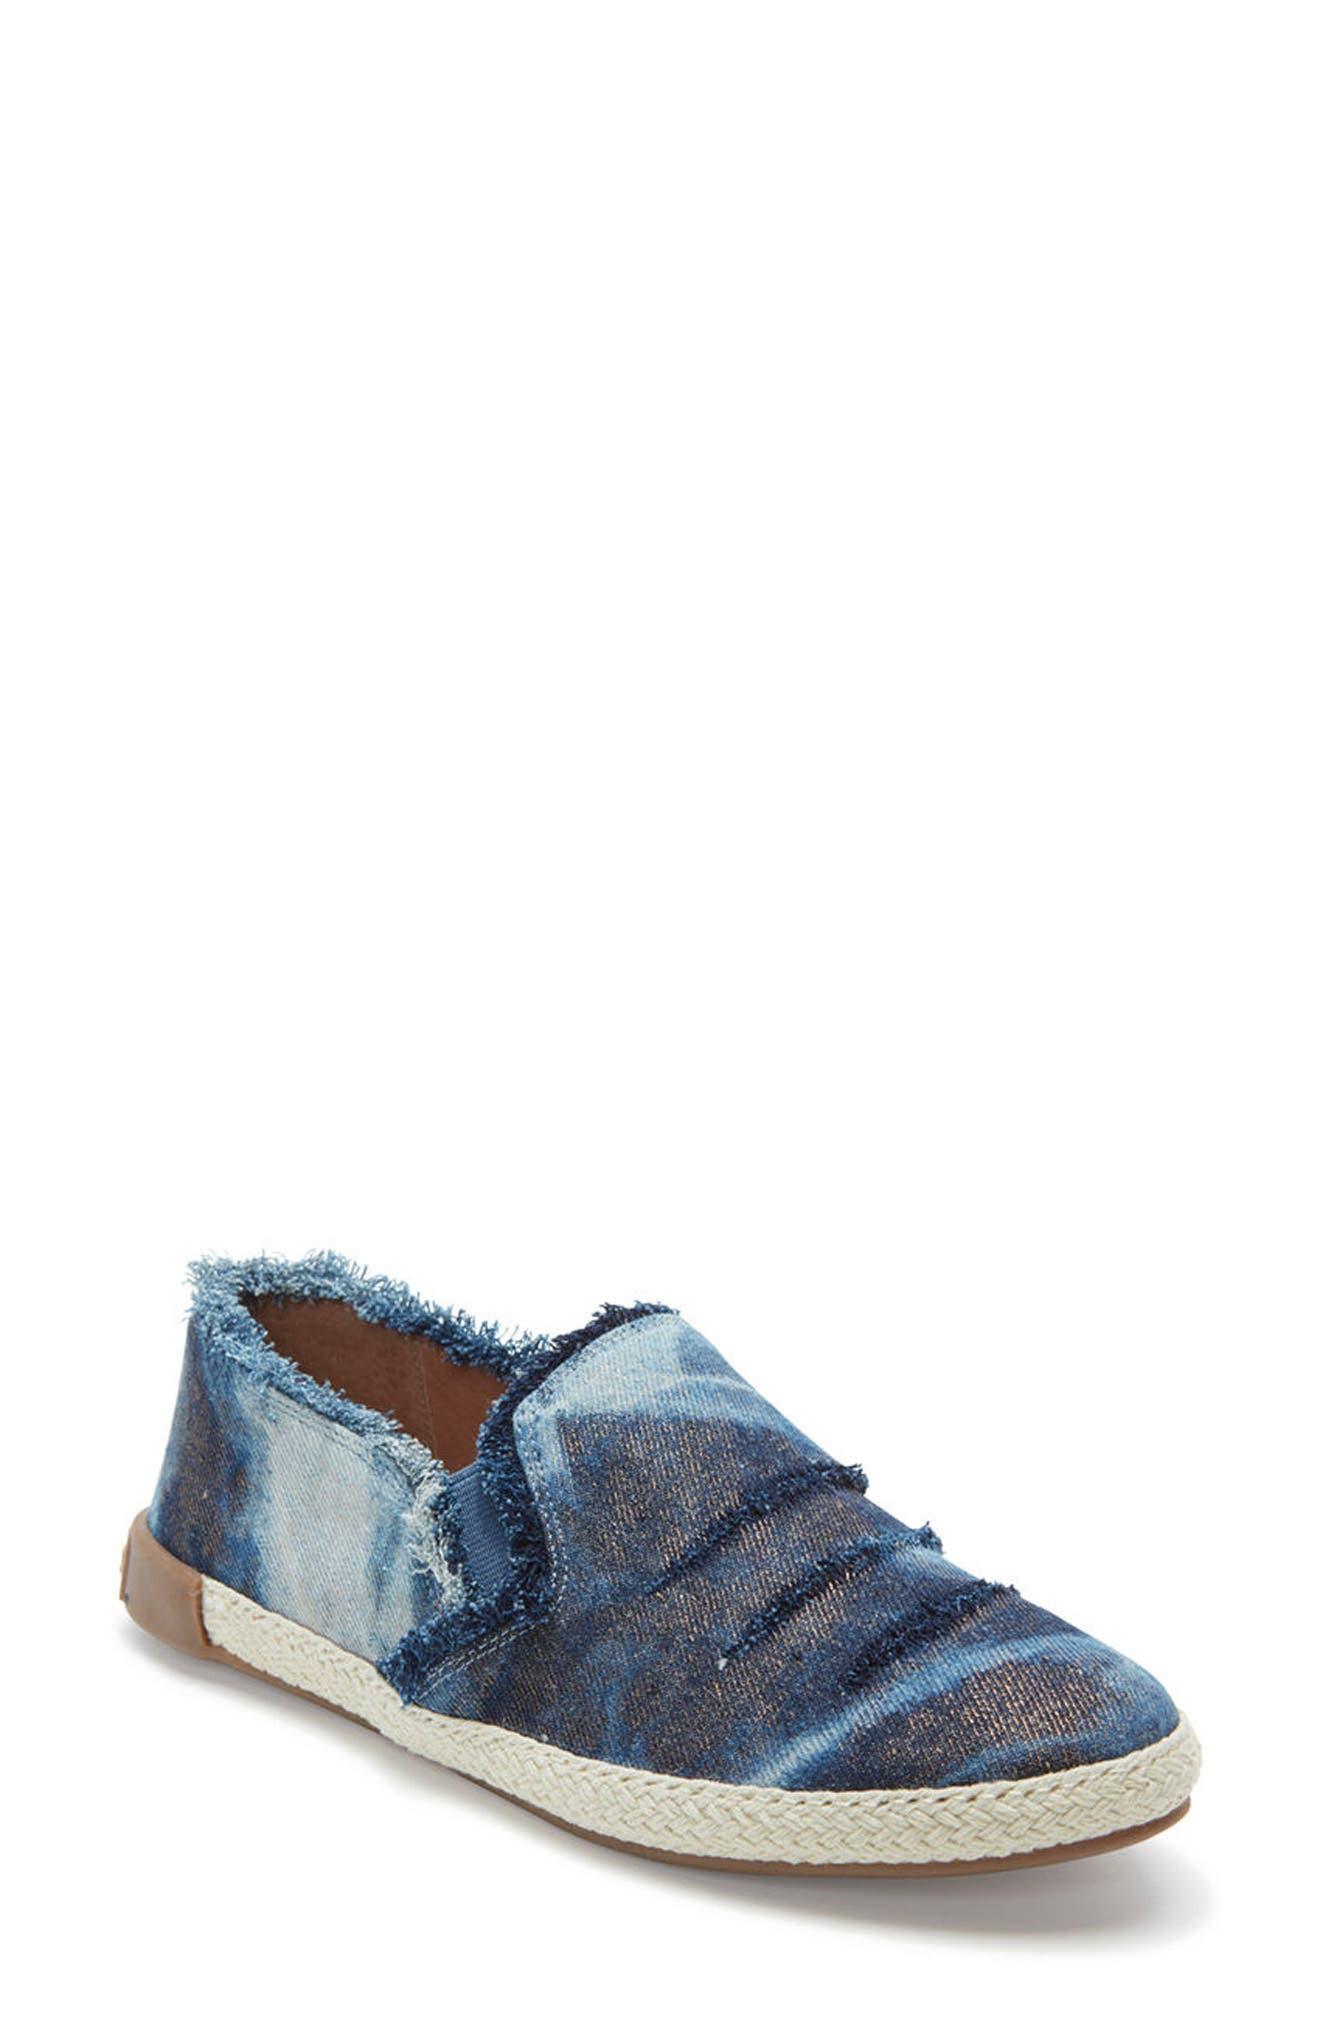 Adam Tucker Marin Slip-On Sneaker,                         Main,                         color, Blue Champagne Denim Fabric